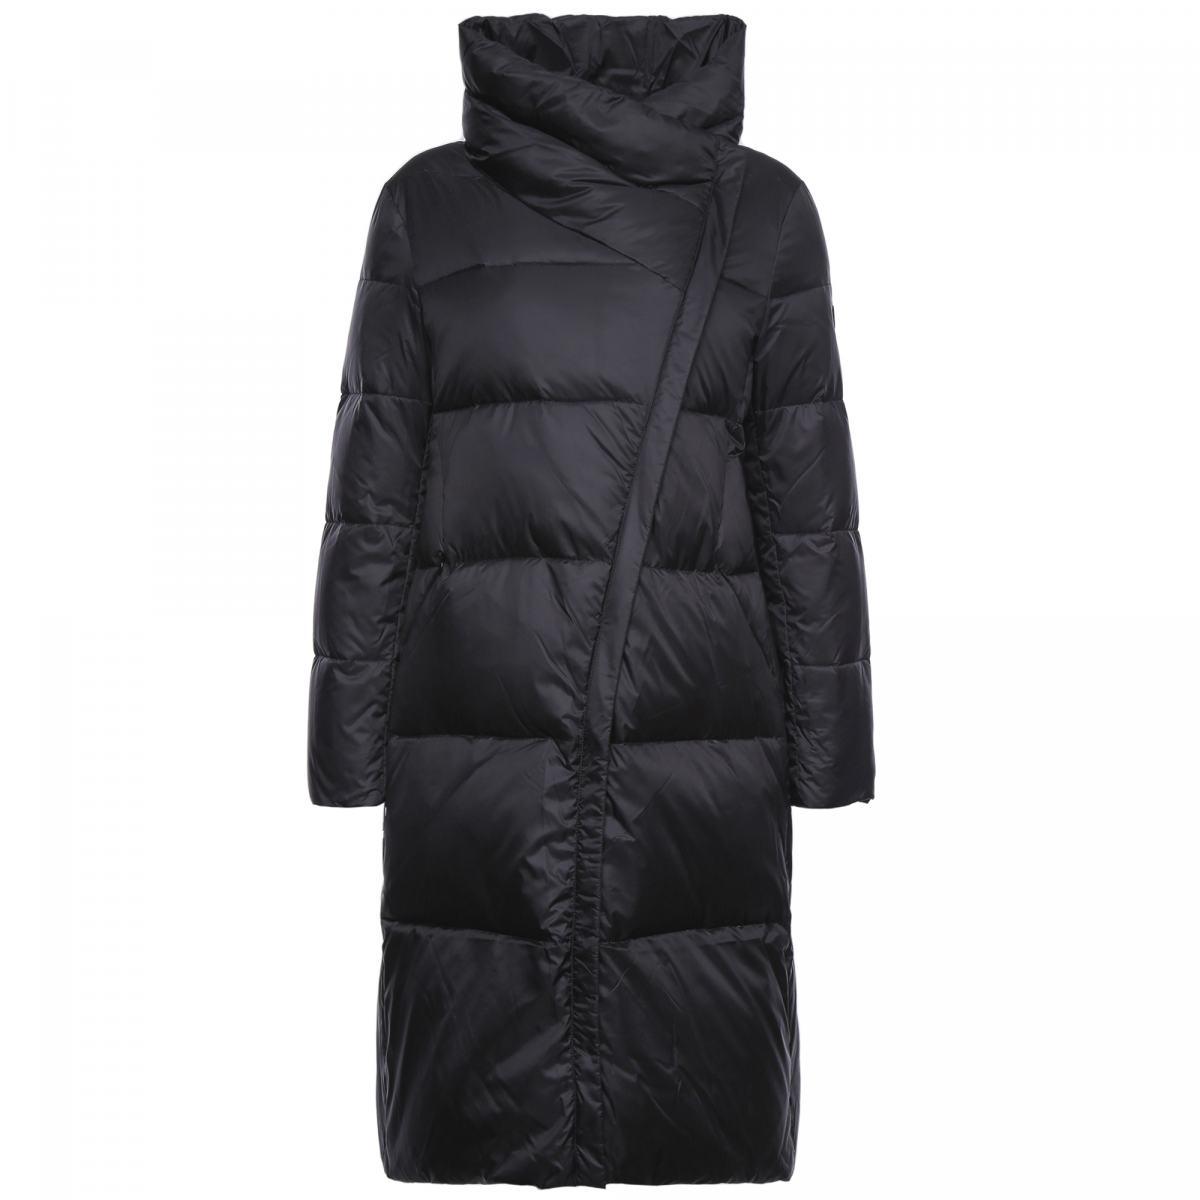 Пальто Baldinini черного цвета